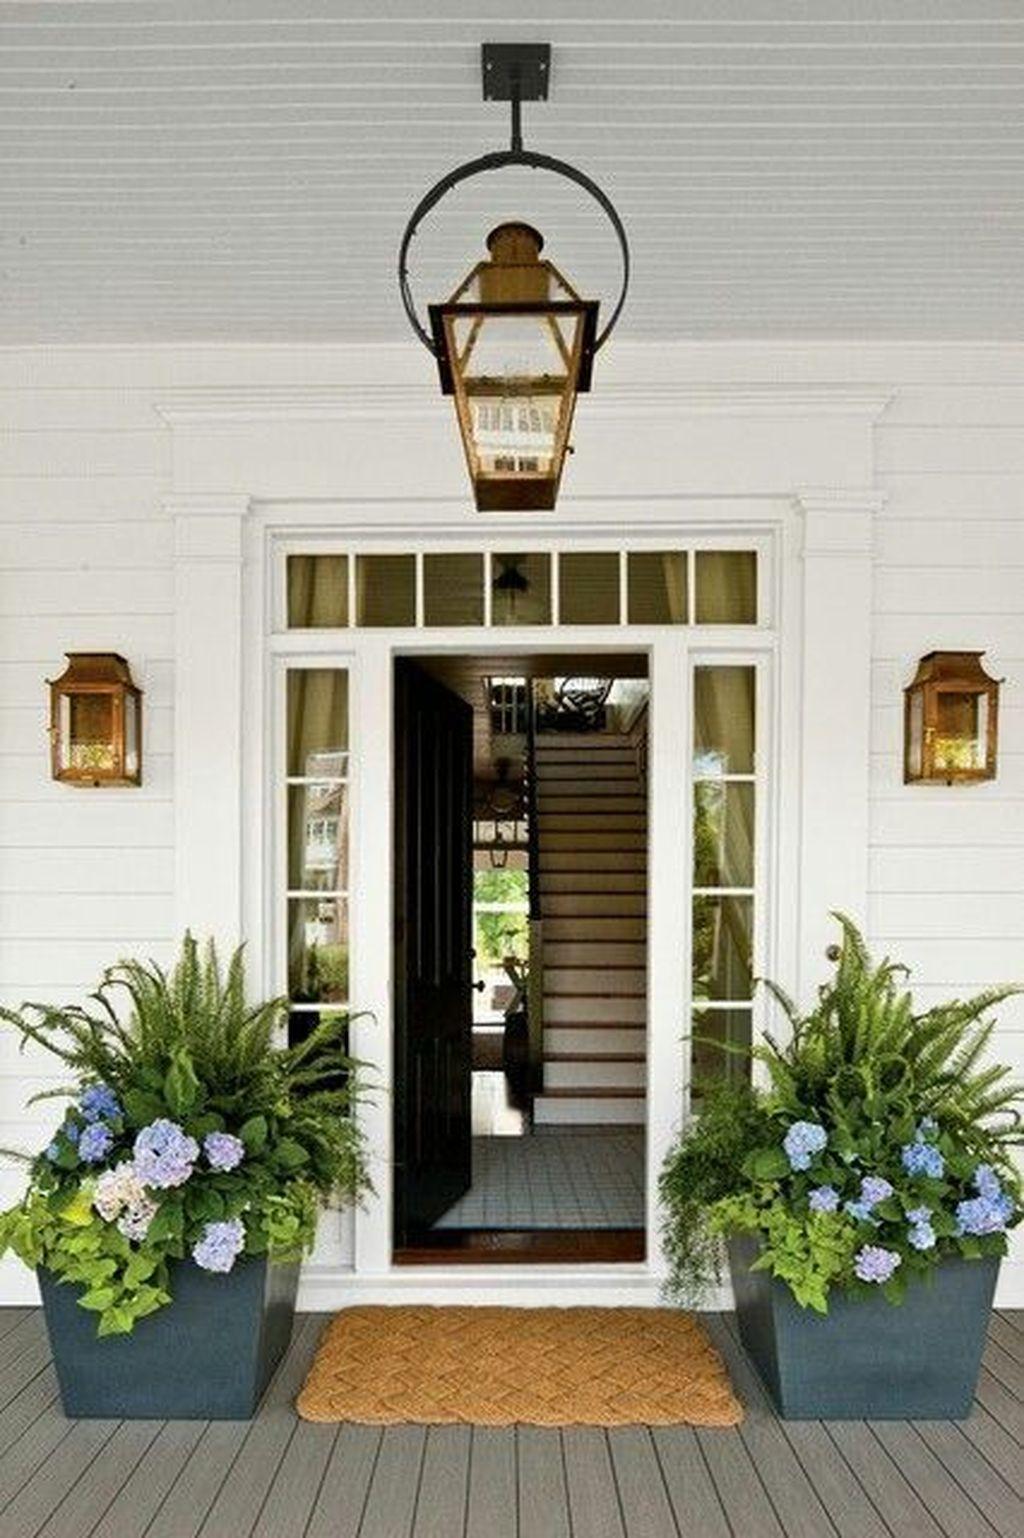 Inspiring Spring Planters Design Ideas For Front Door 07